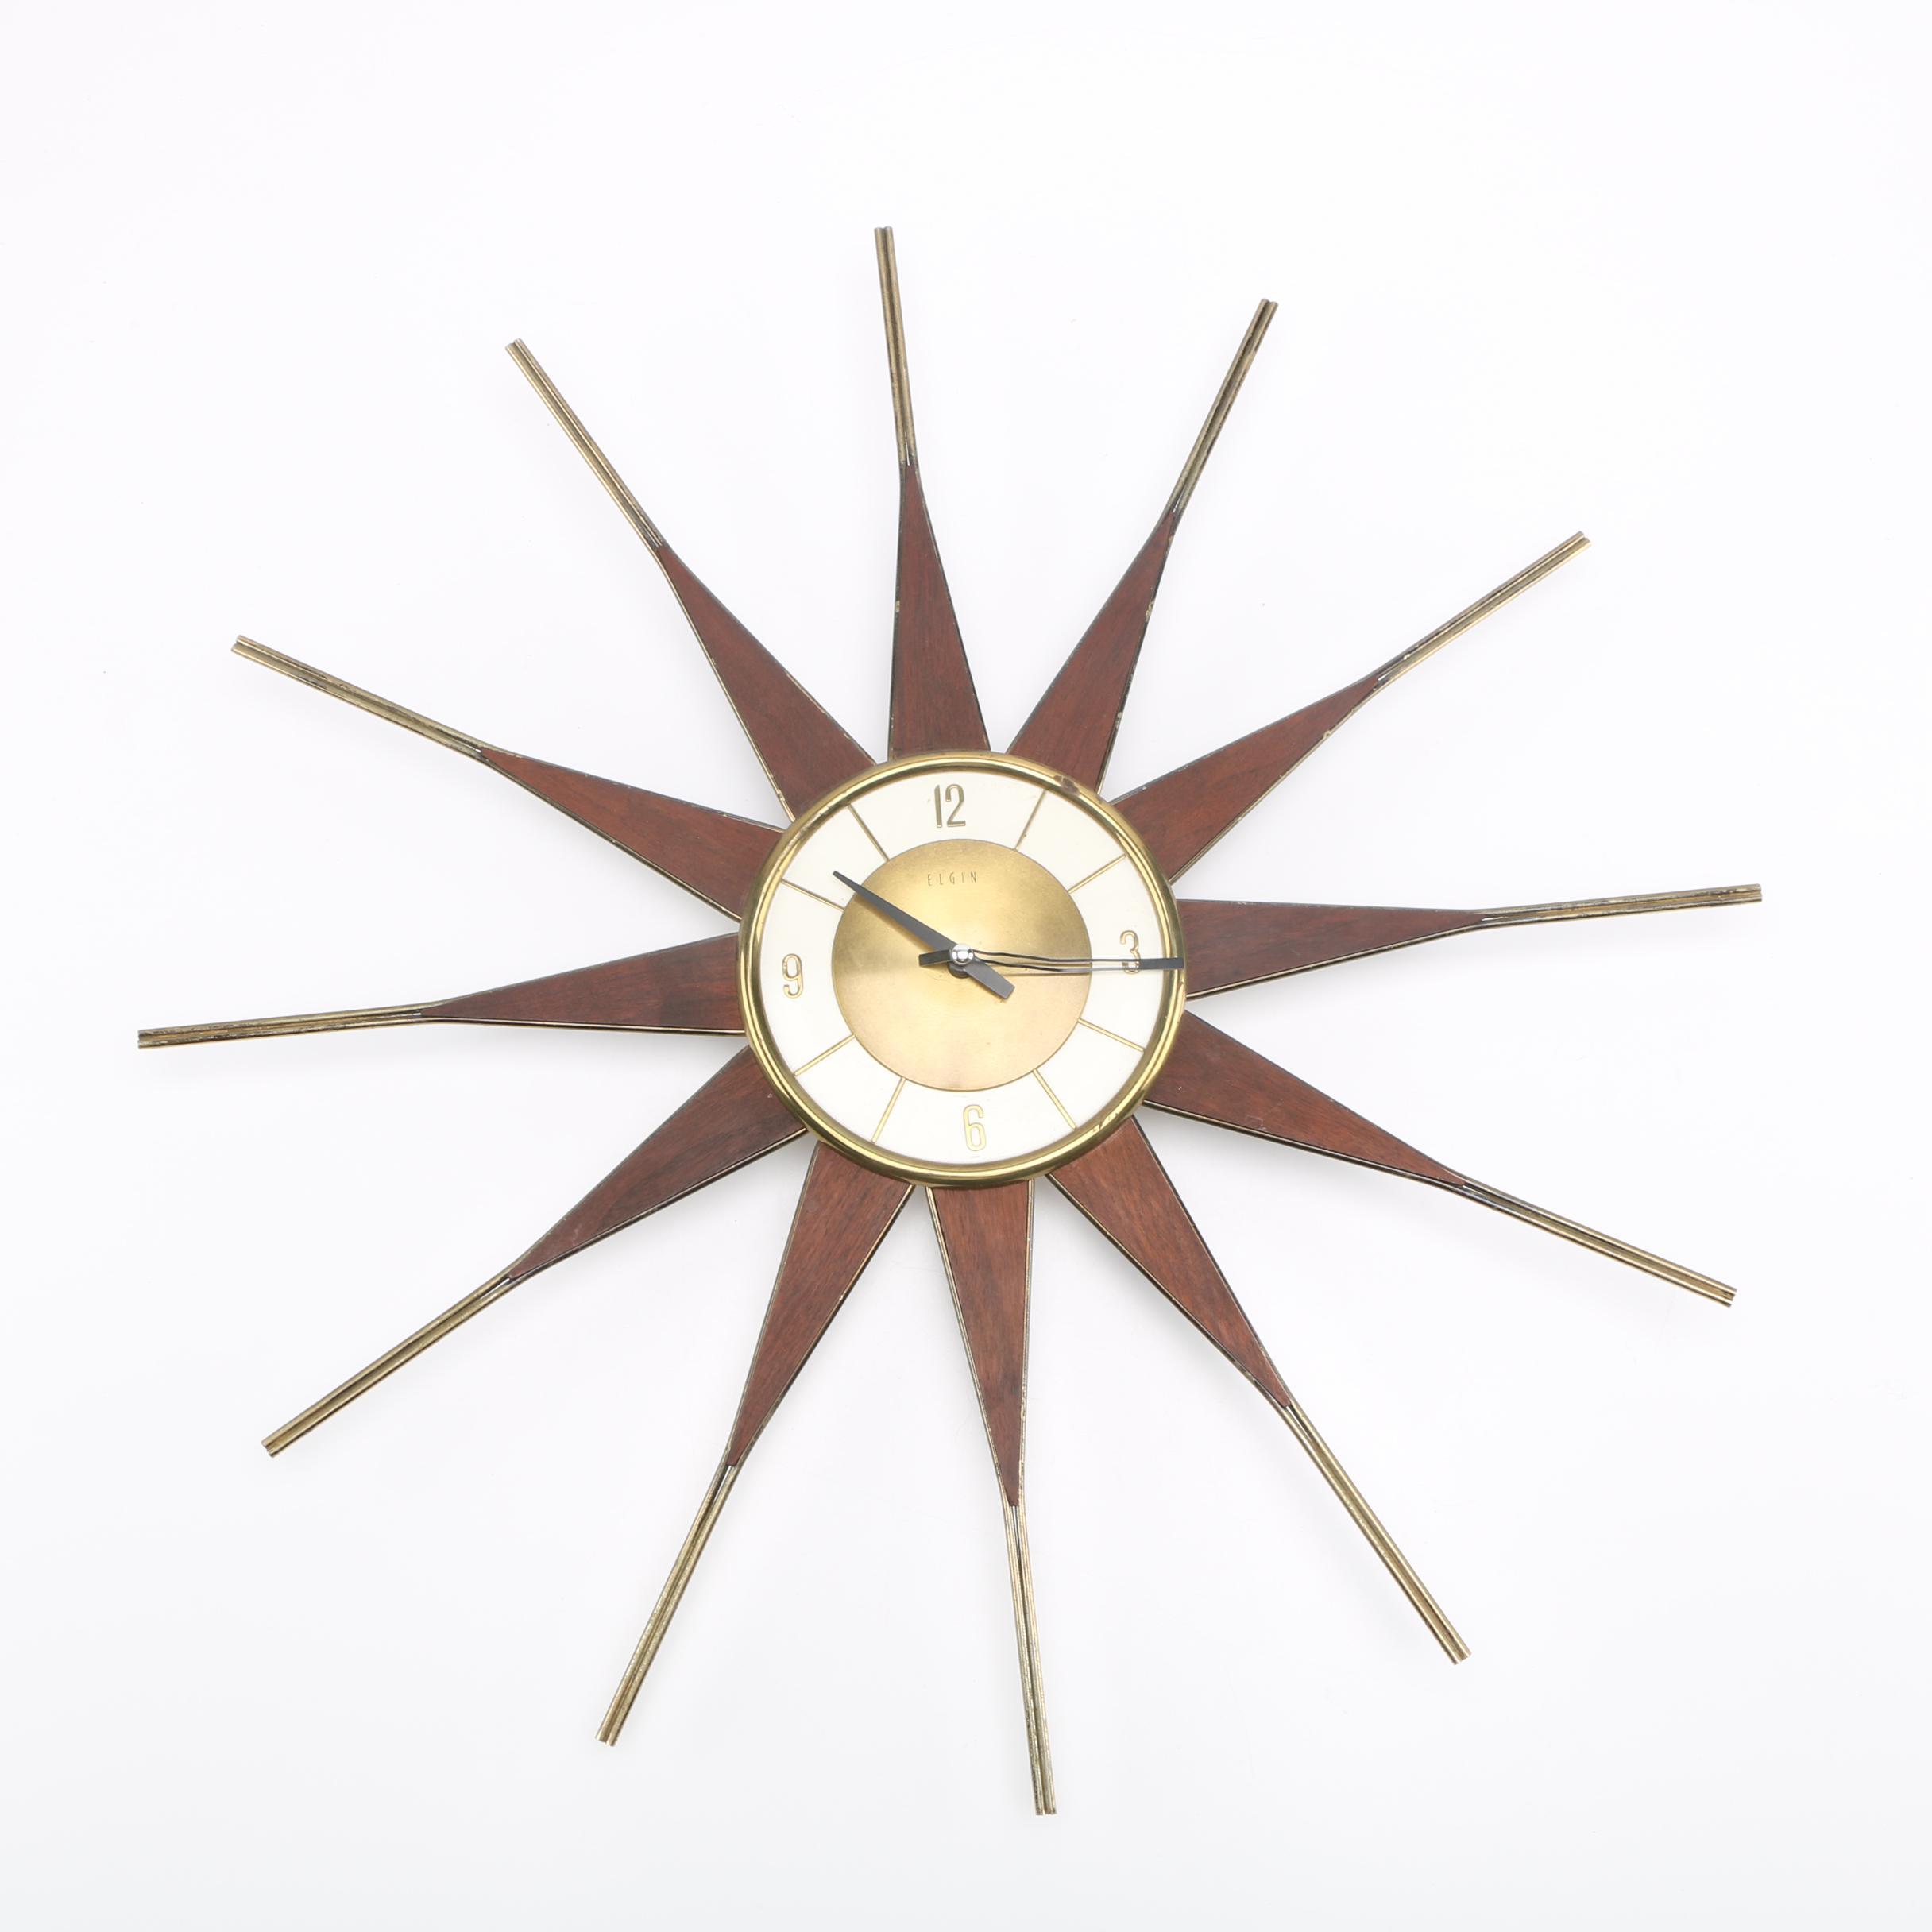 Vintage Clocks retro style00006.JPG